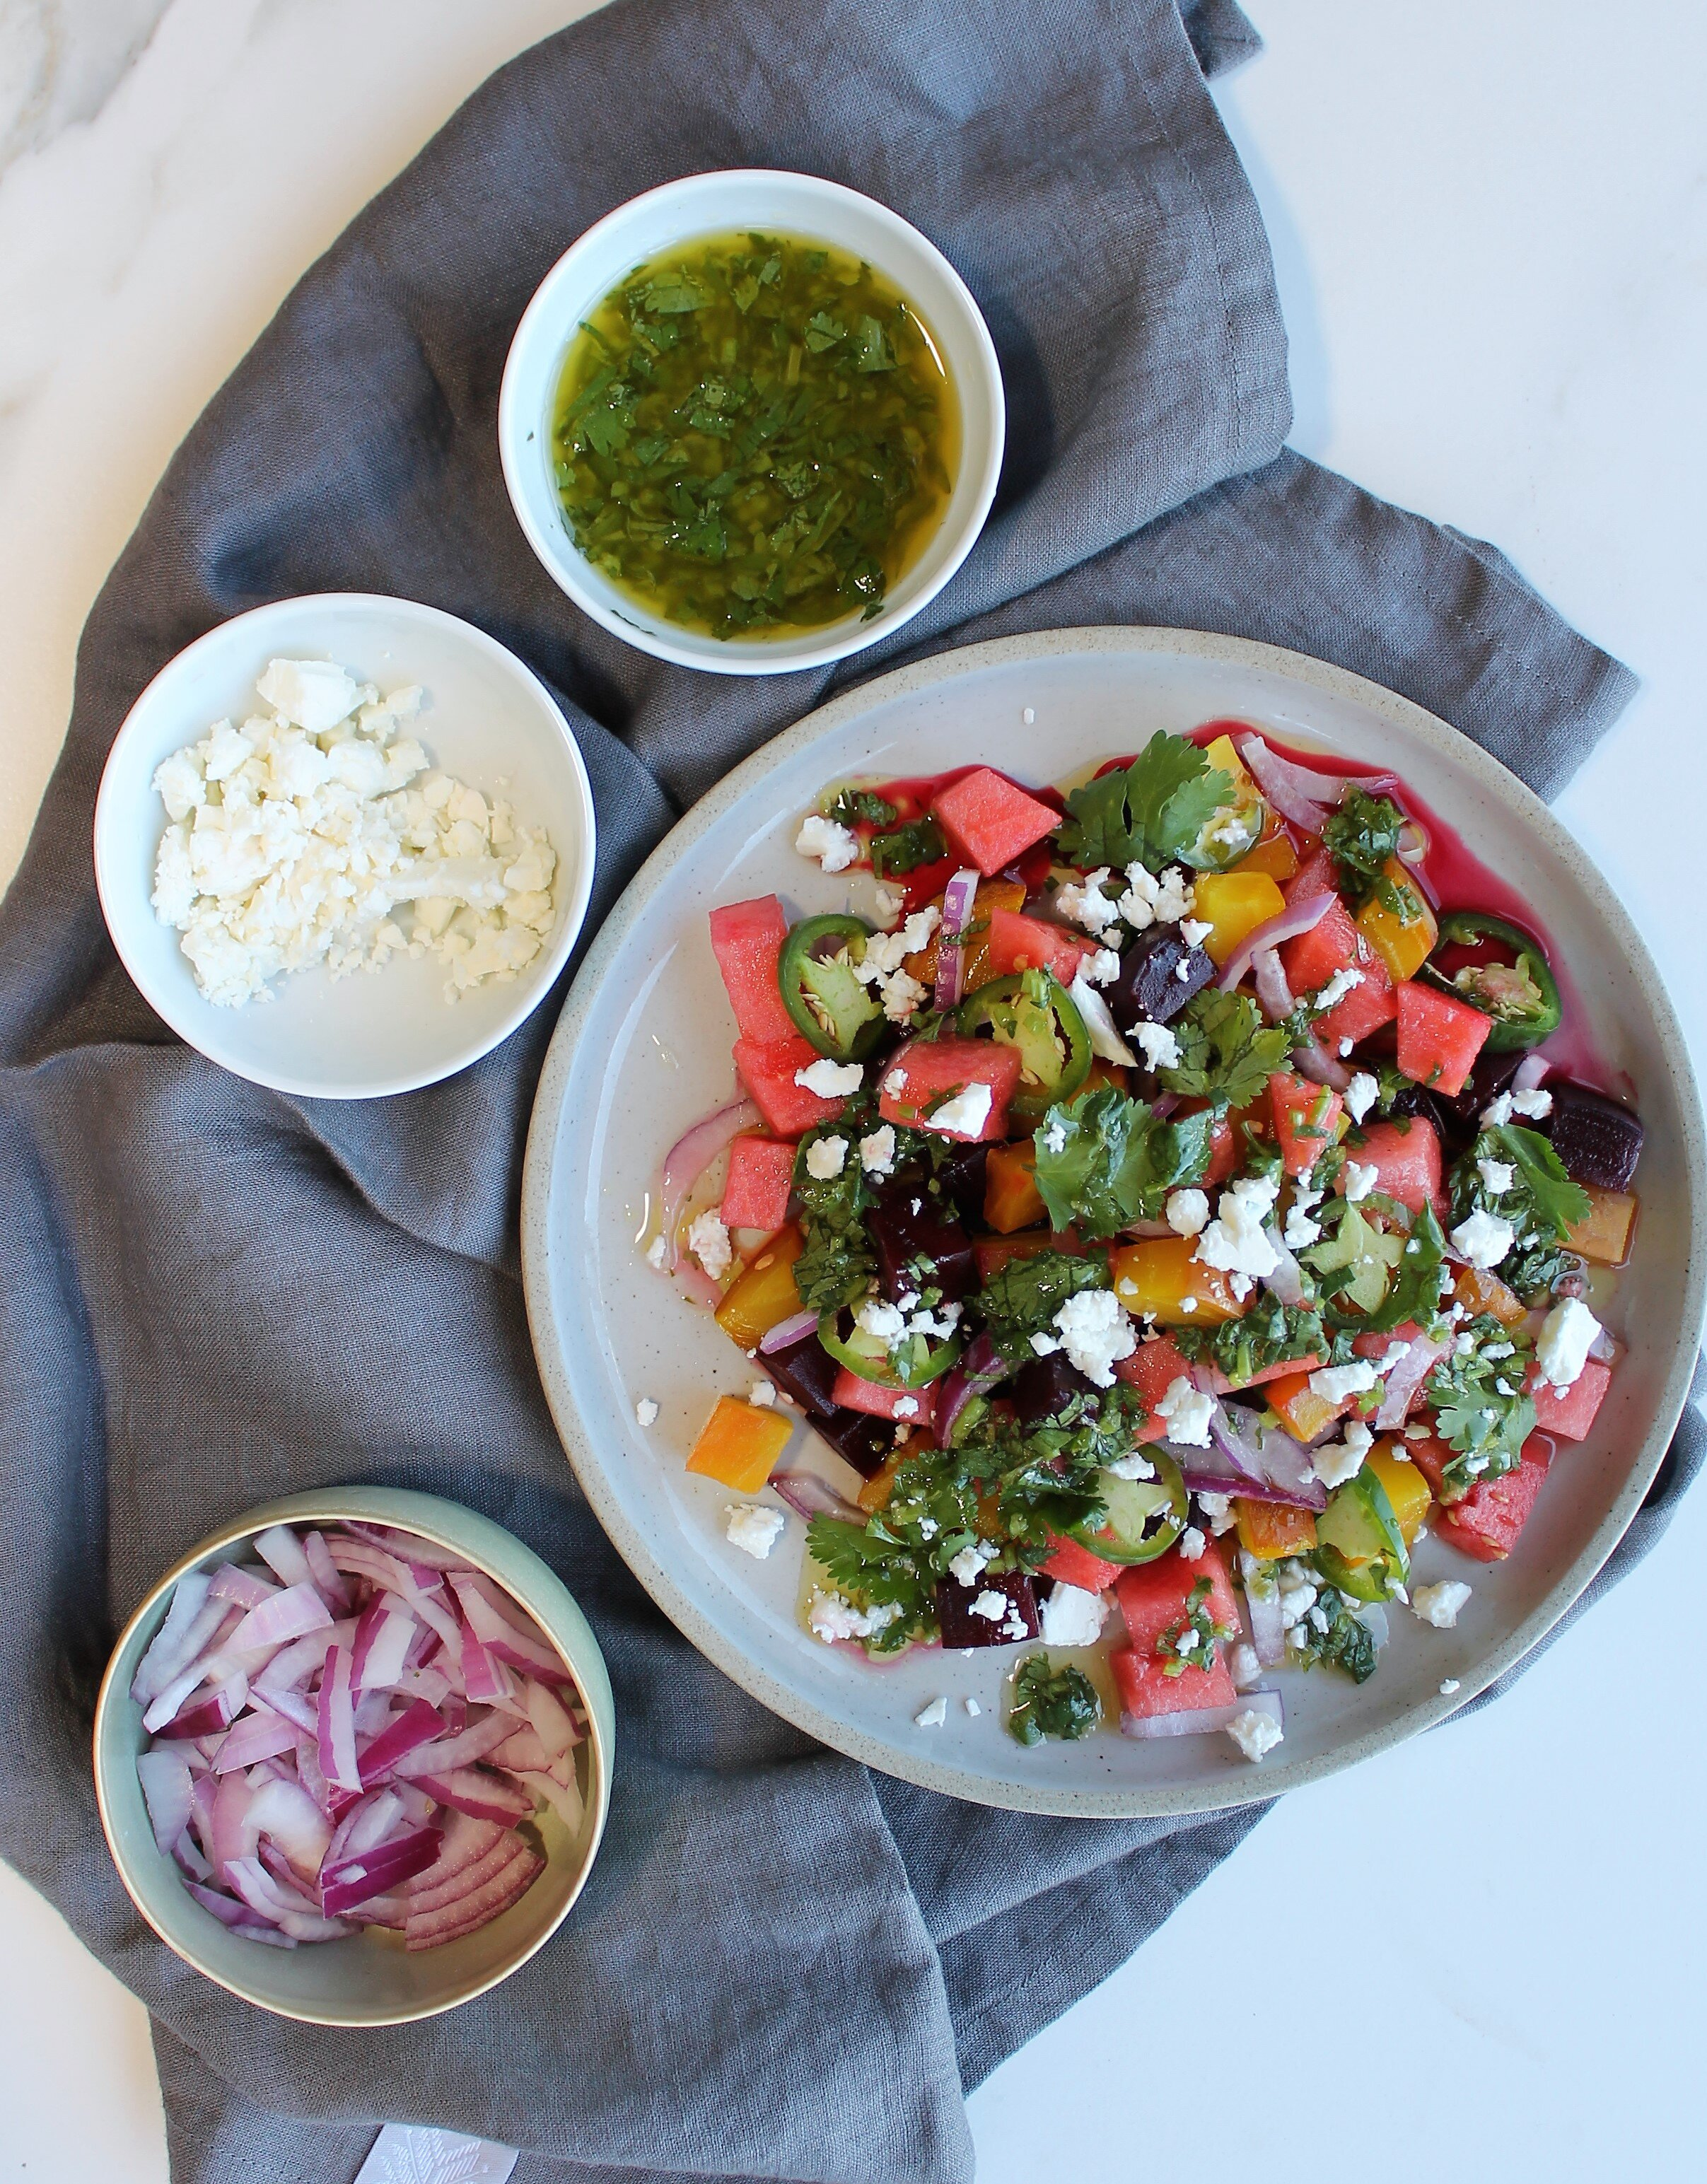 watermelon_lime_beet_salad.JPG